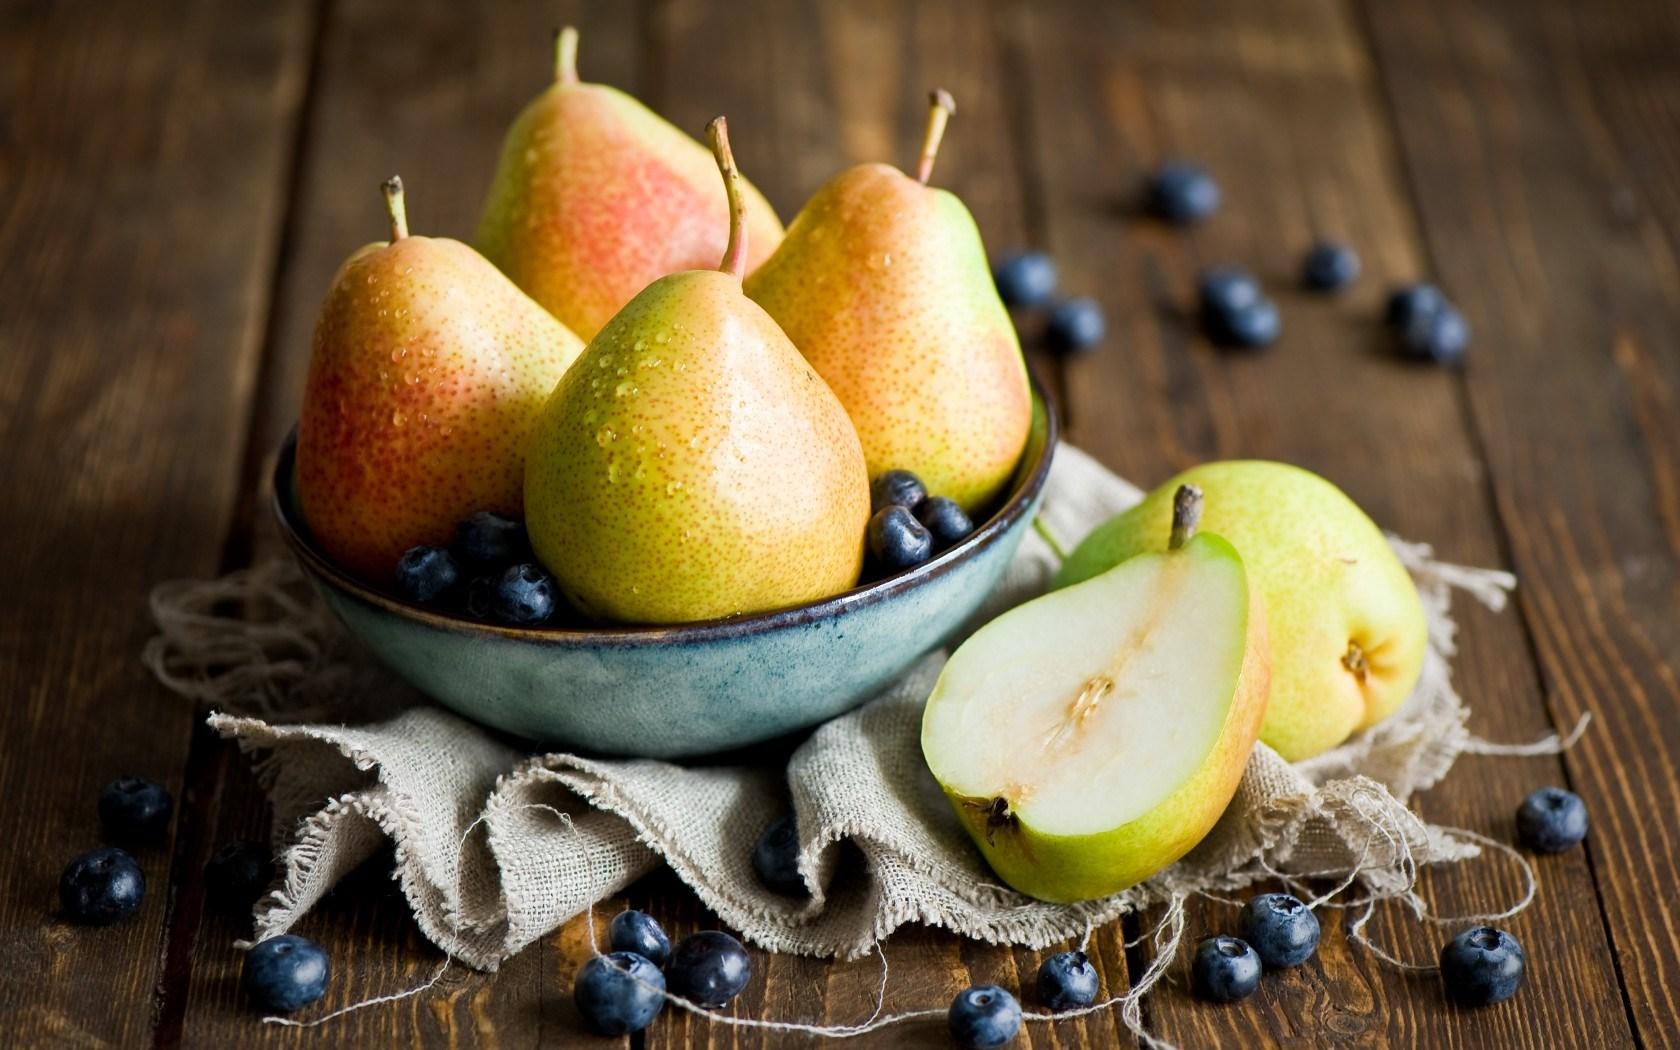 Pears Fruit Blueberries Blueberry